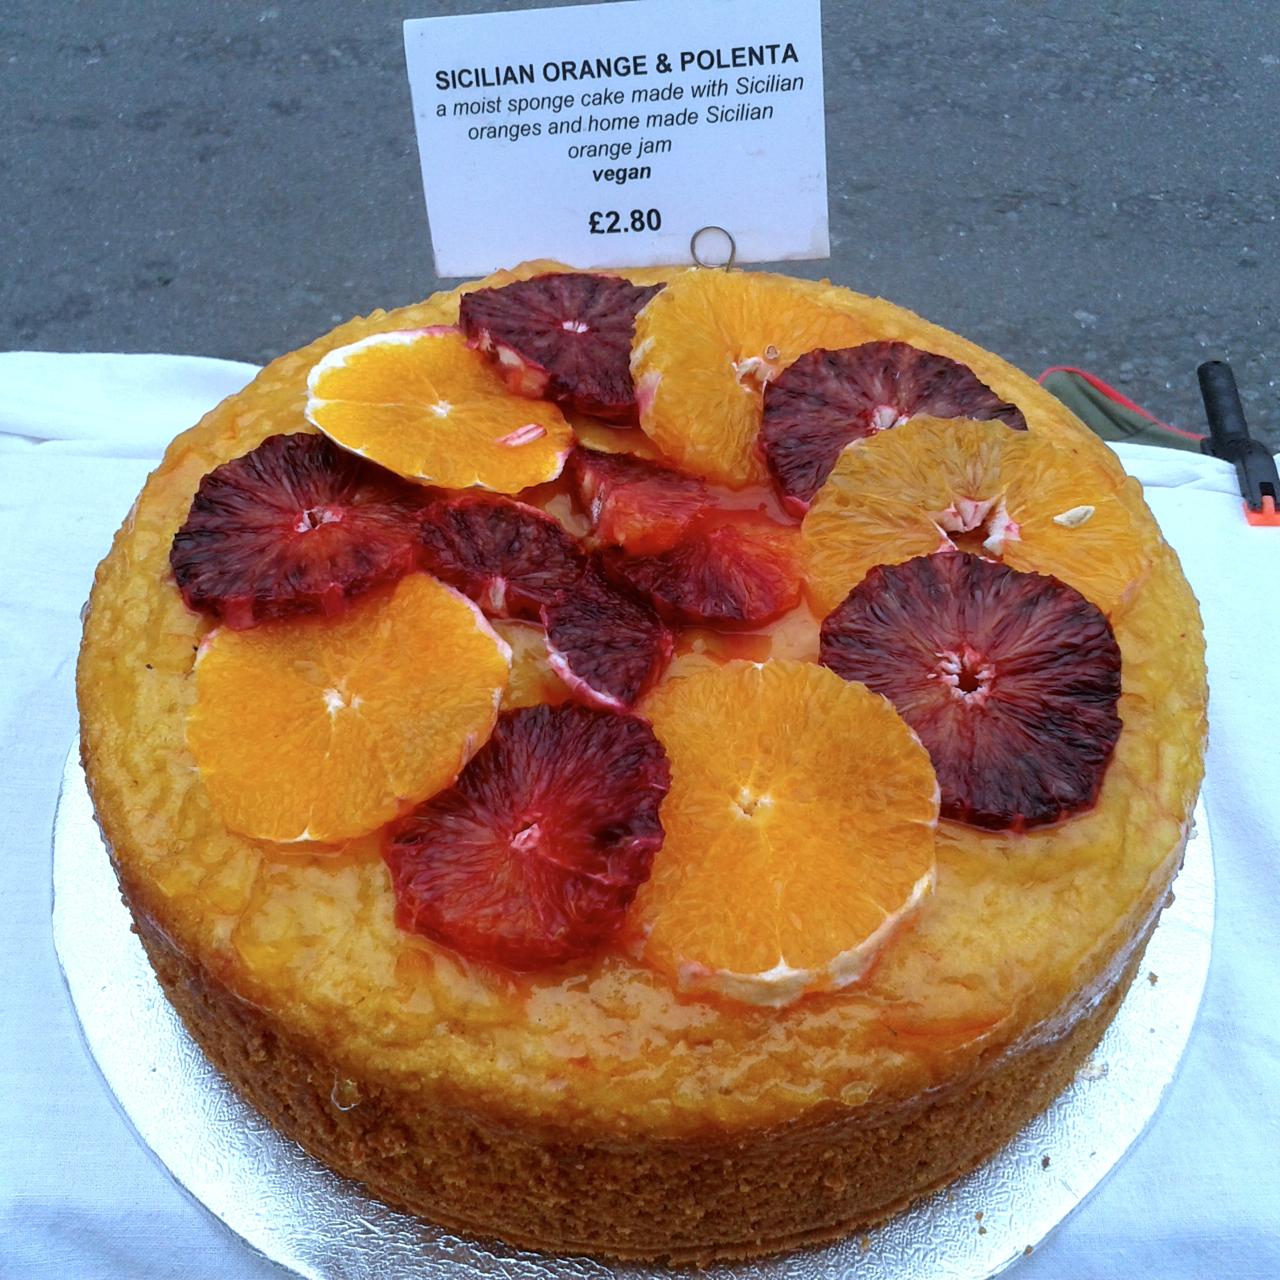 https://i2.wp.com/fatgayvegan.com/wp-content/uploads/2014/06/polenta-cake.jpg?fit=1280%2C1280